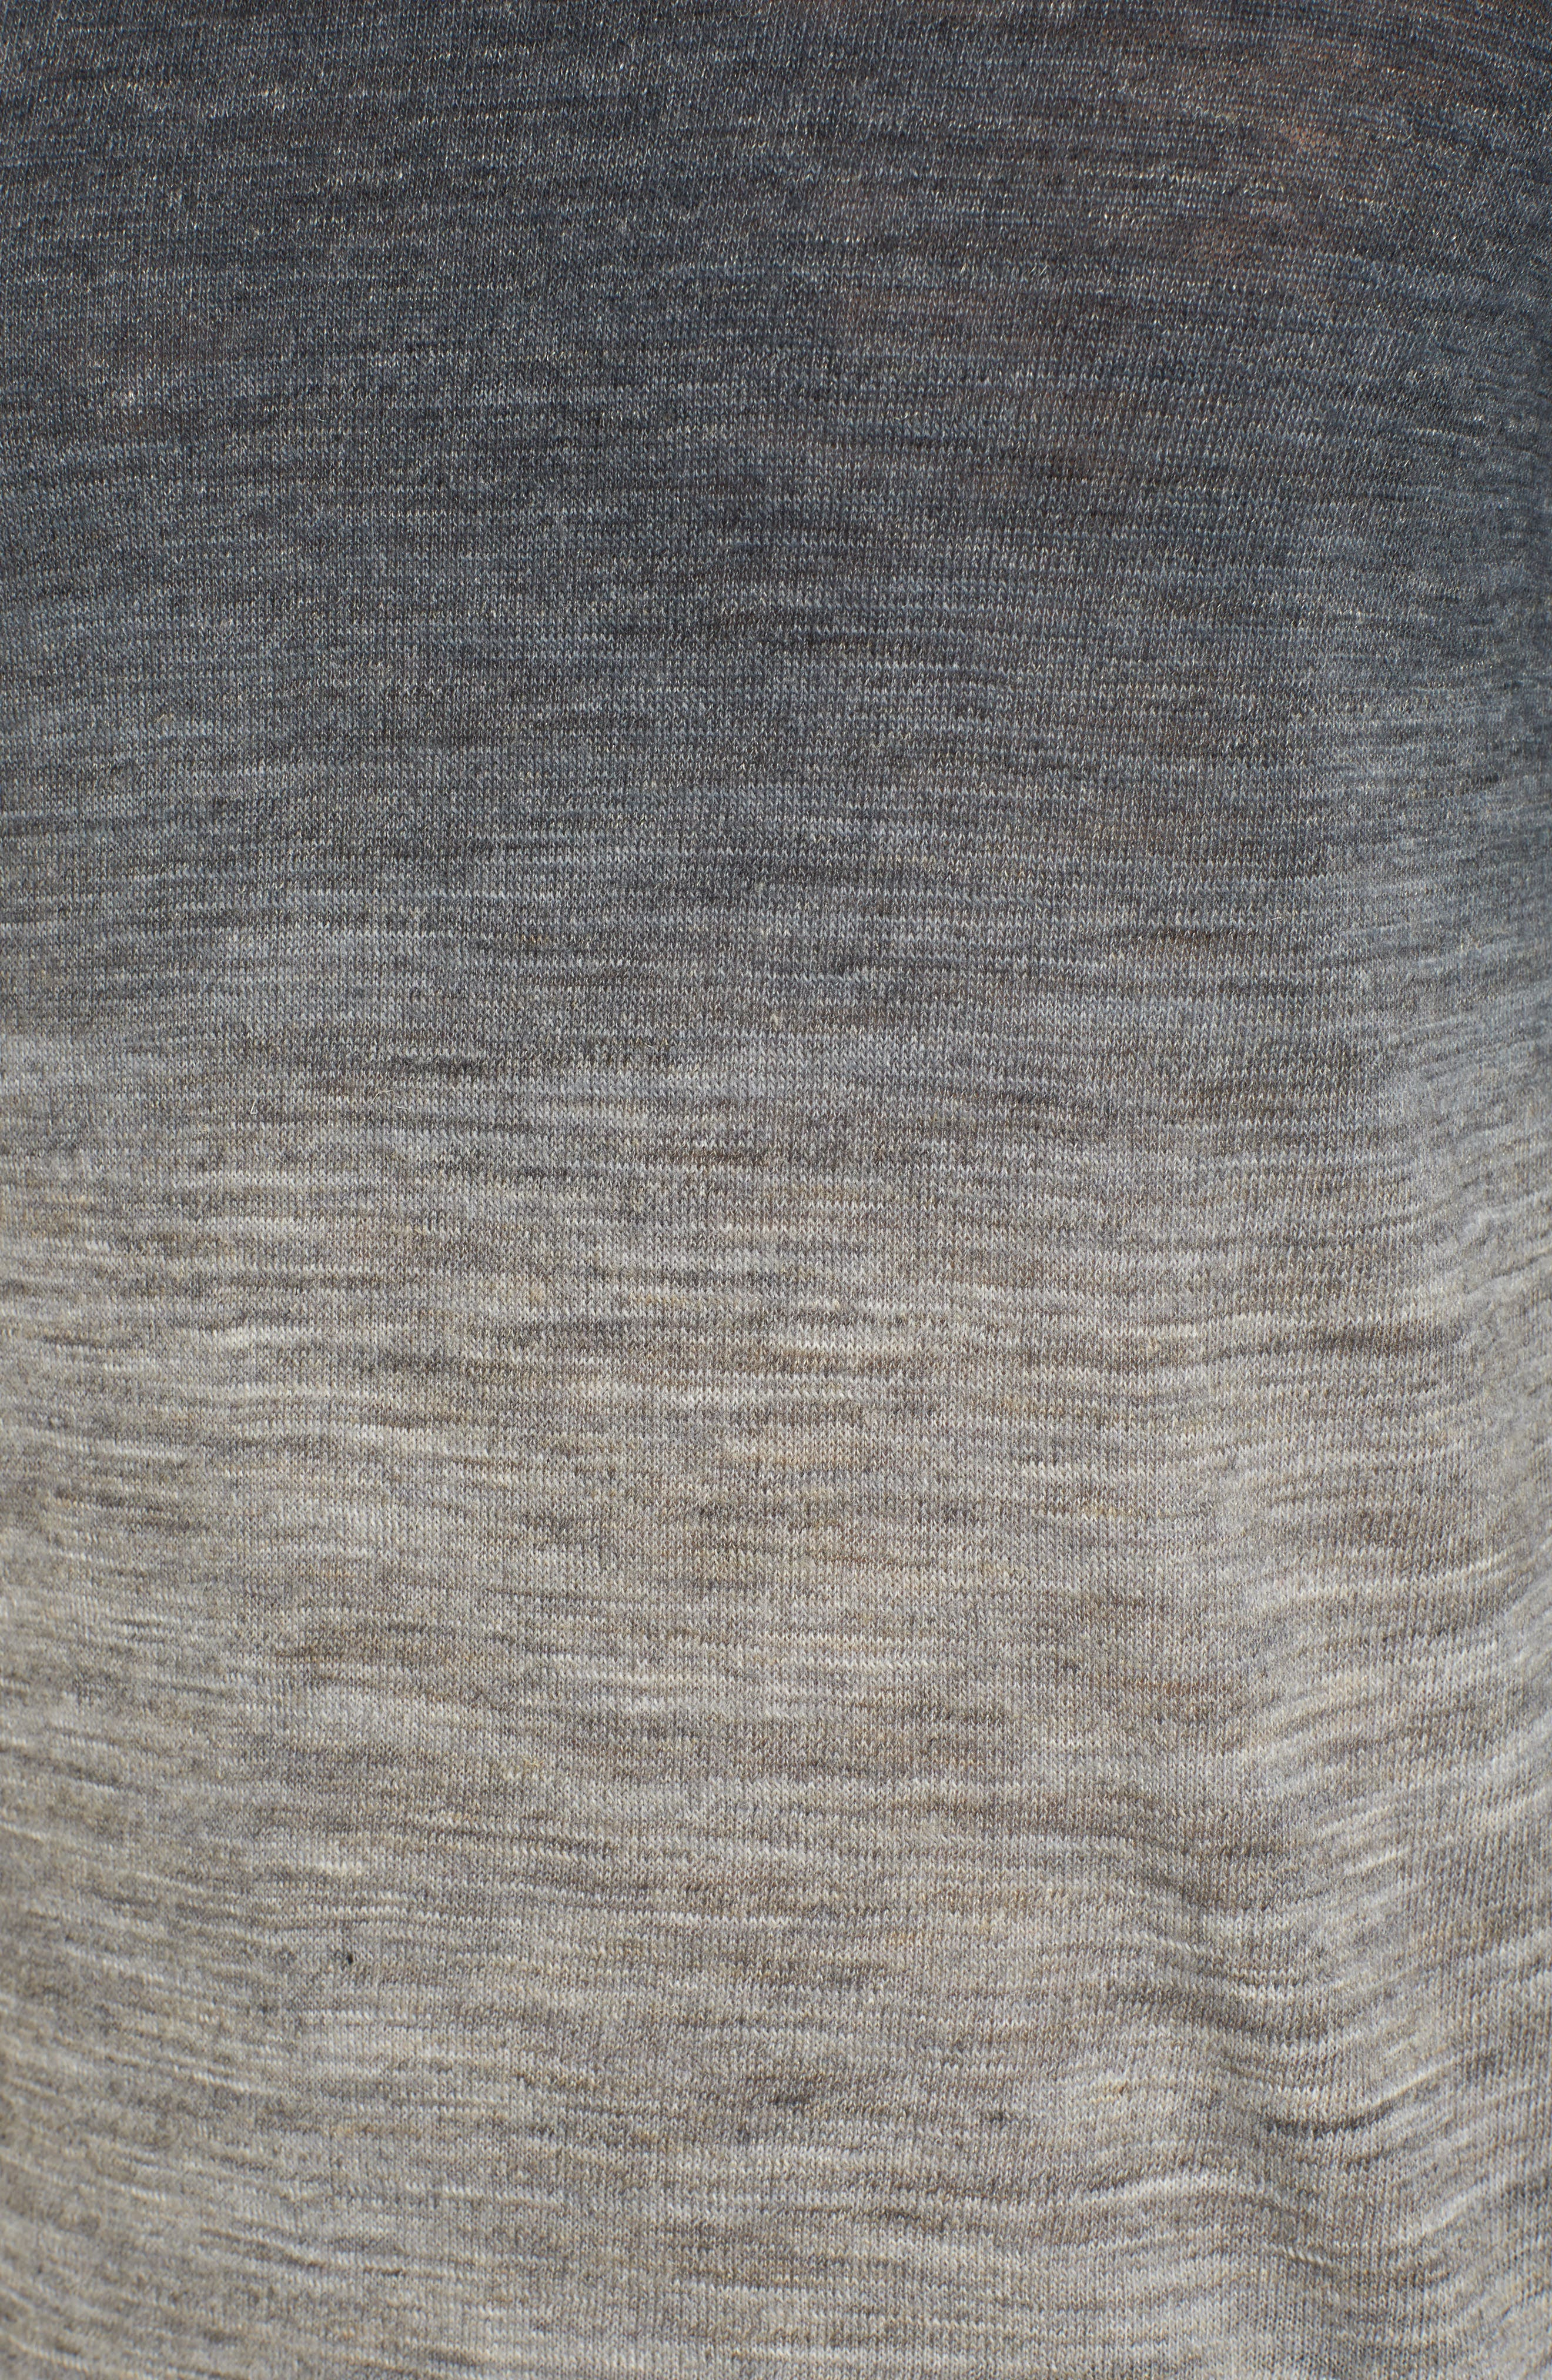 Regular Fit Dip Dye Turtleneck,                             Alternate thumbnail 5, color,                             020